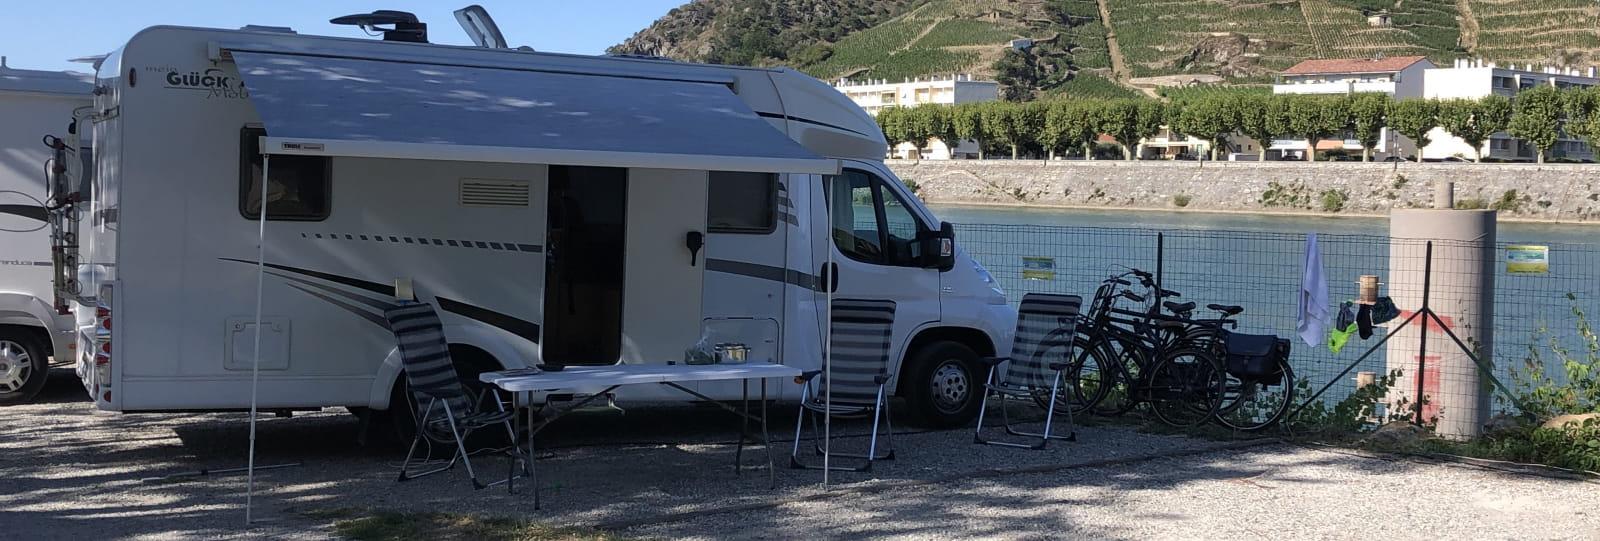 Aire de camping-car - Camping Le Rhône